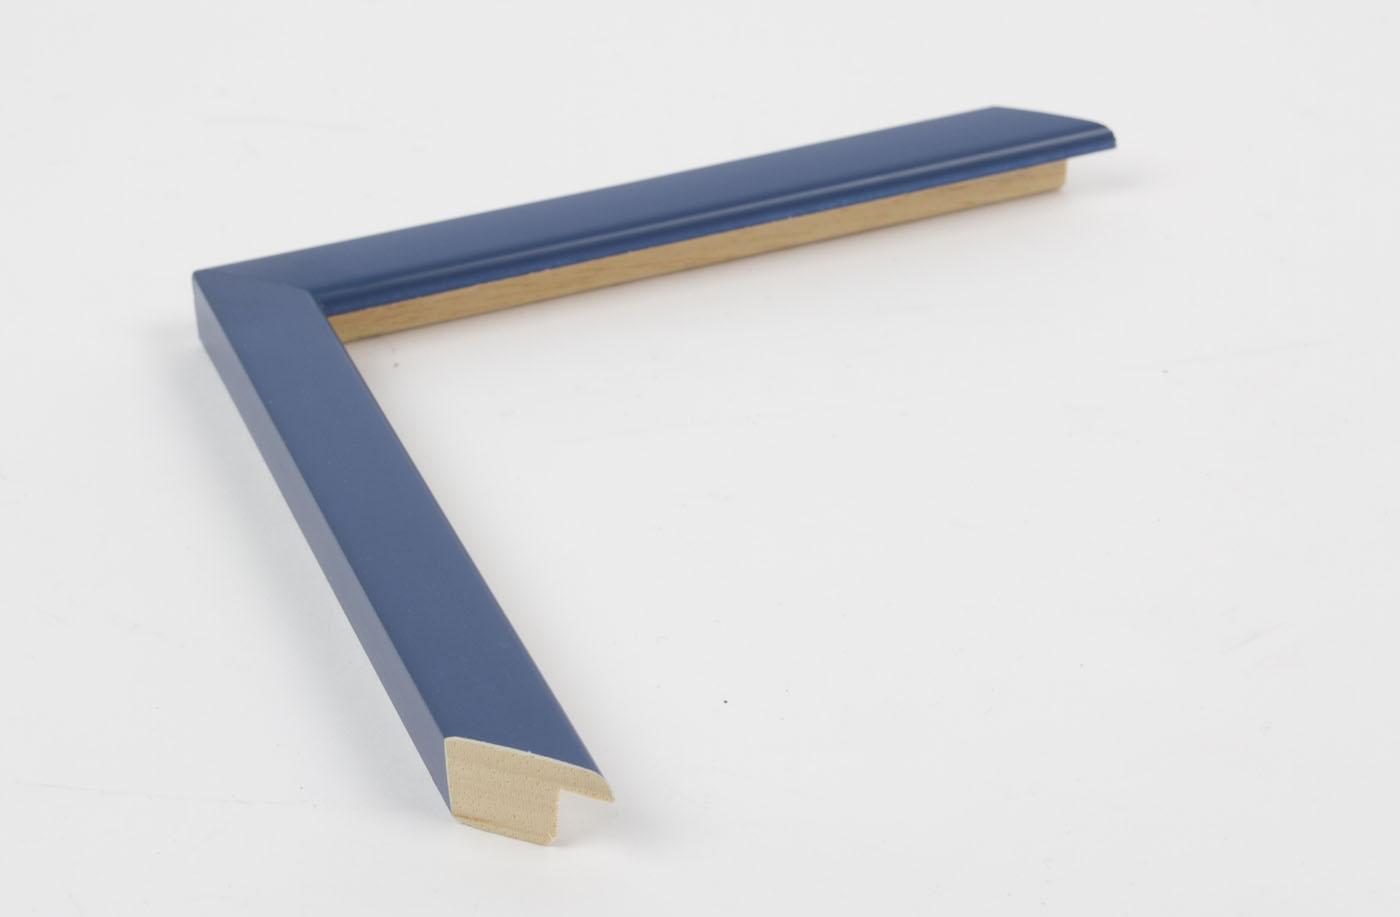 00290-544-A-PASTEL-ancho1,8cm-perfil